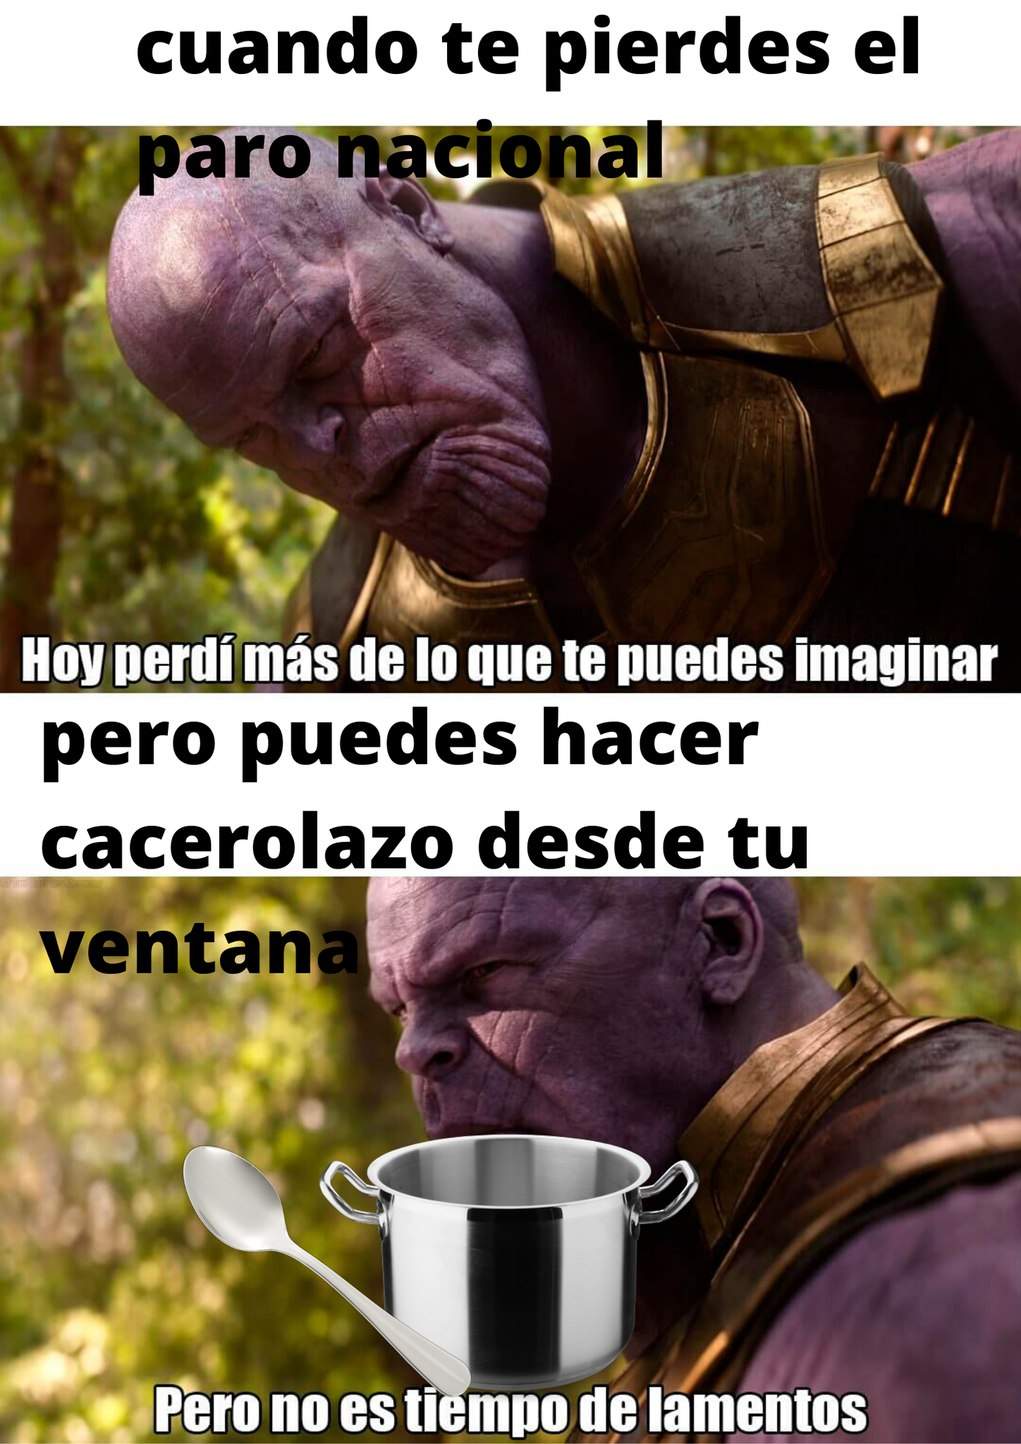 cacerolazo epico - meme